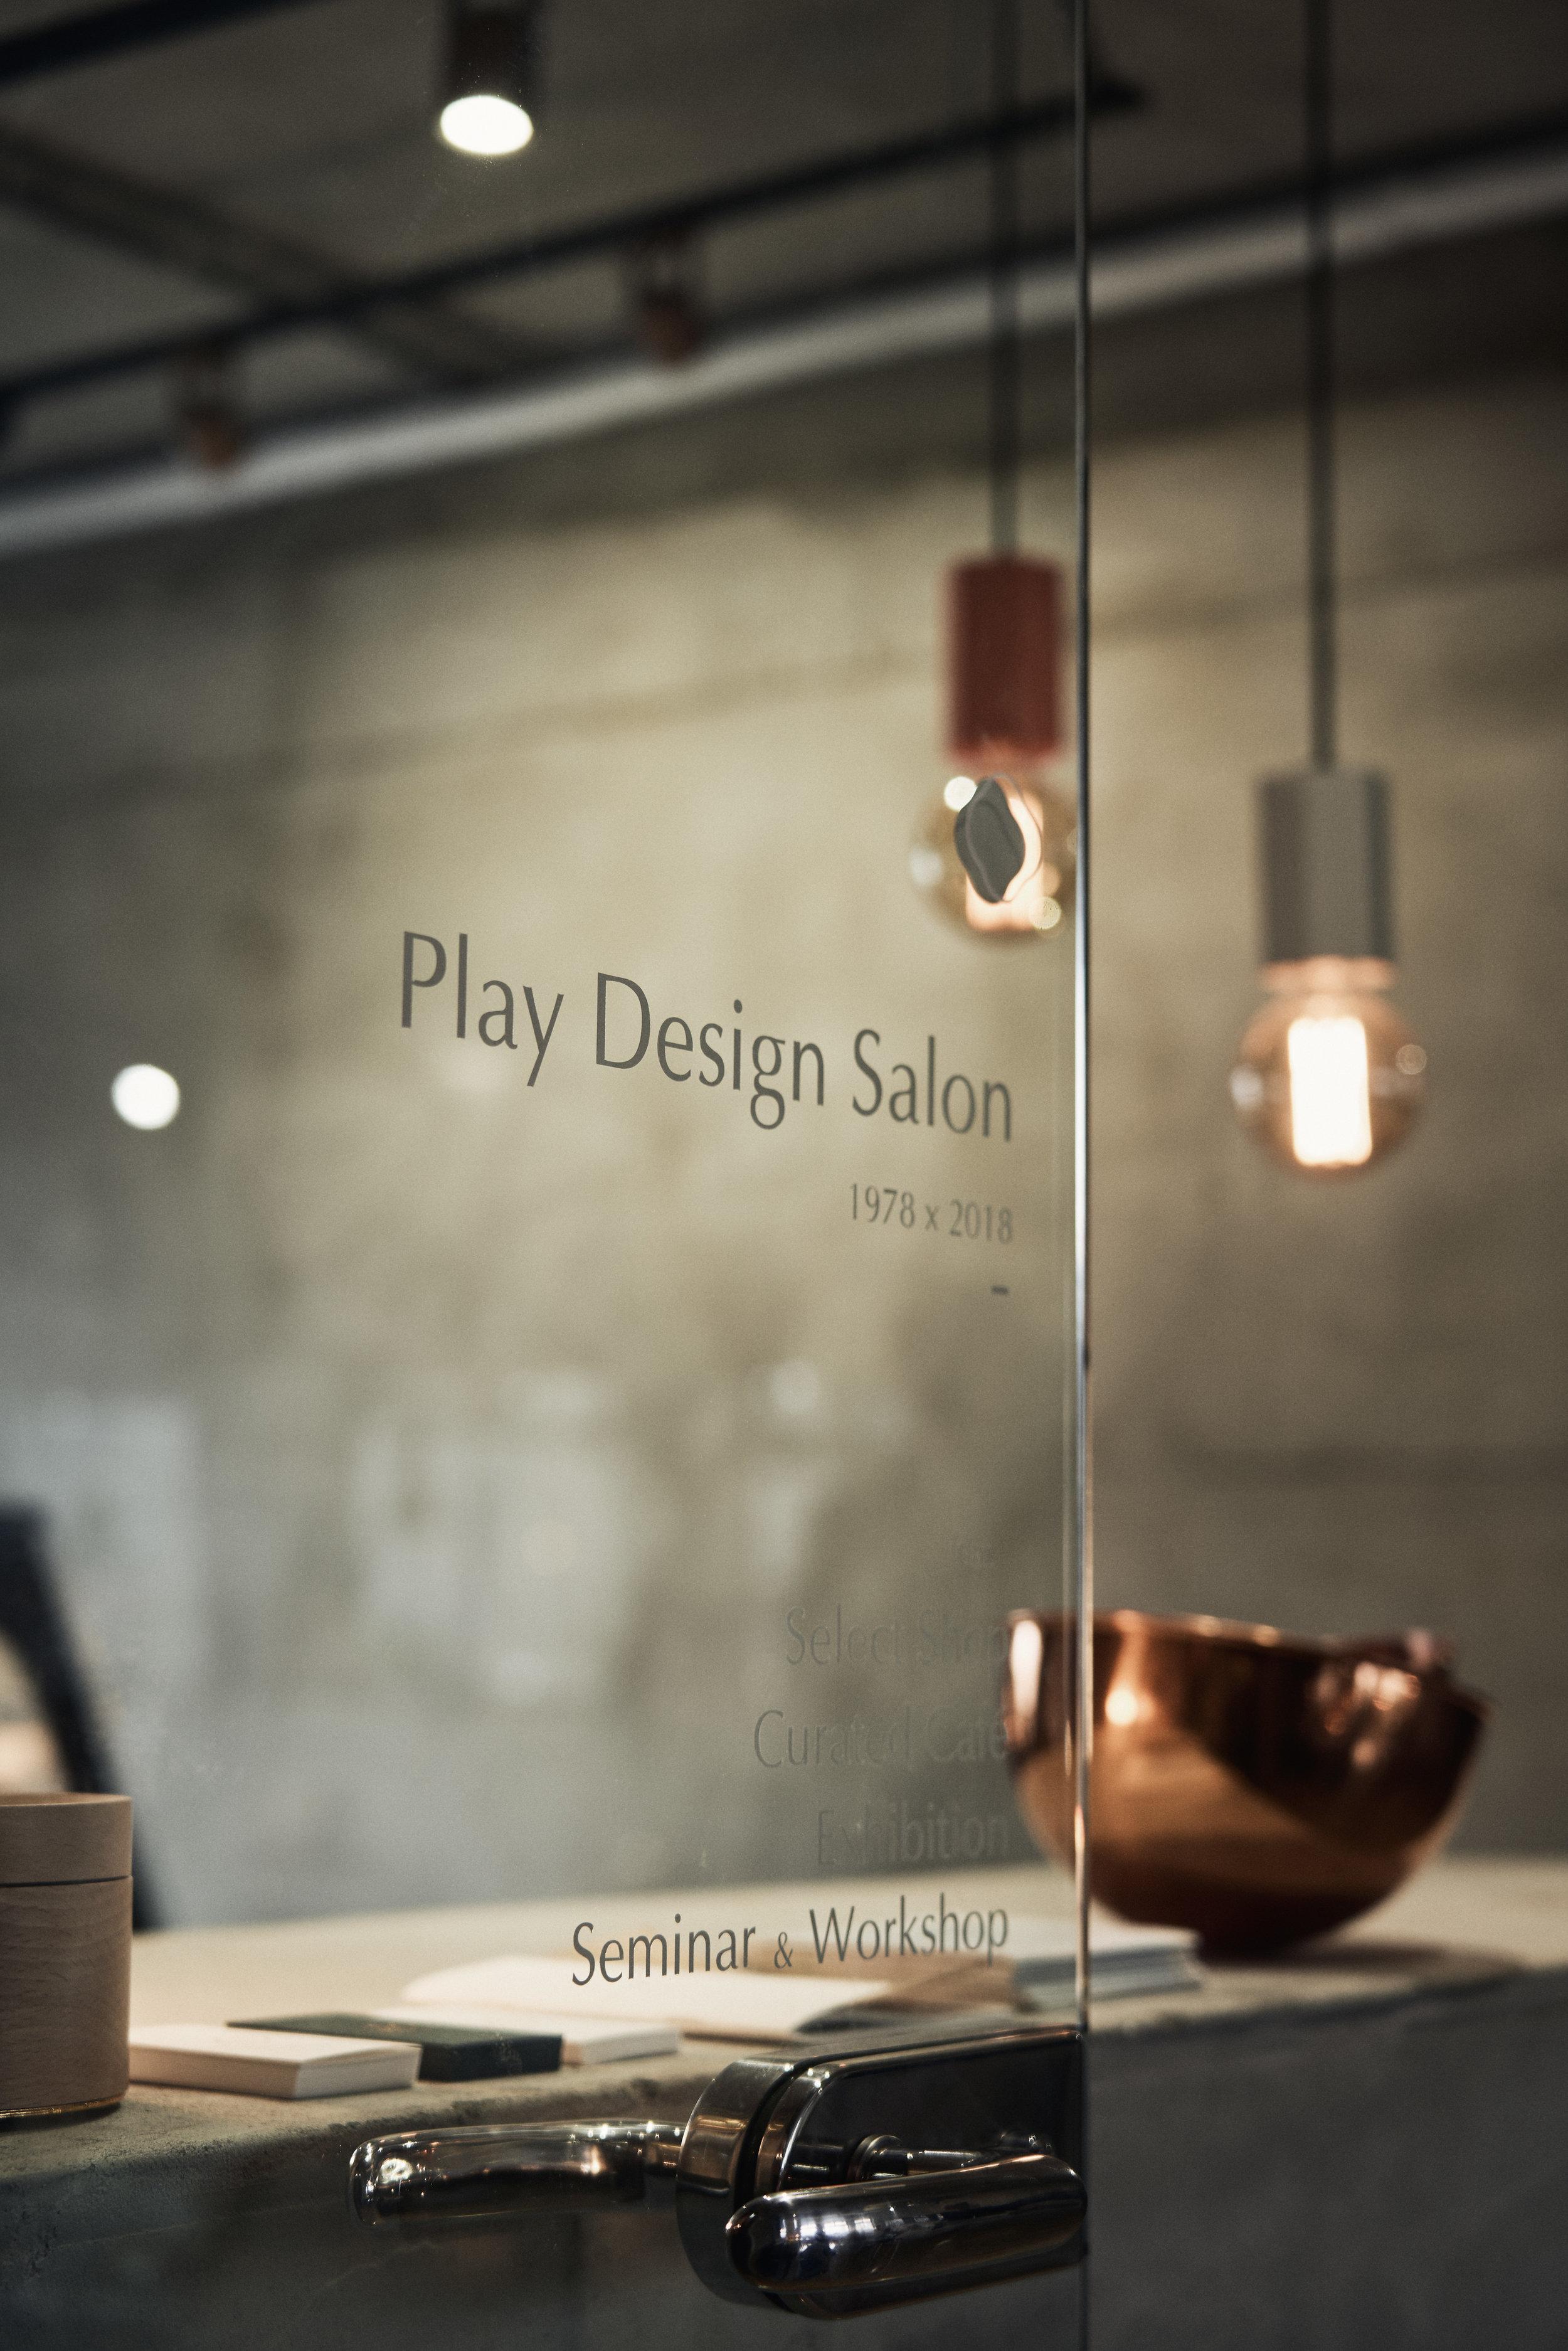 PlayDesignSalon_201811-178.jpg